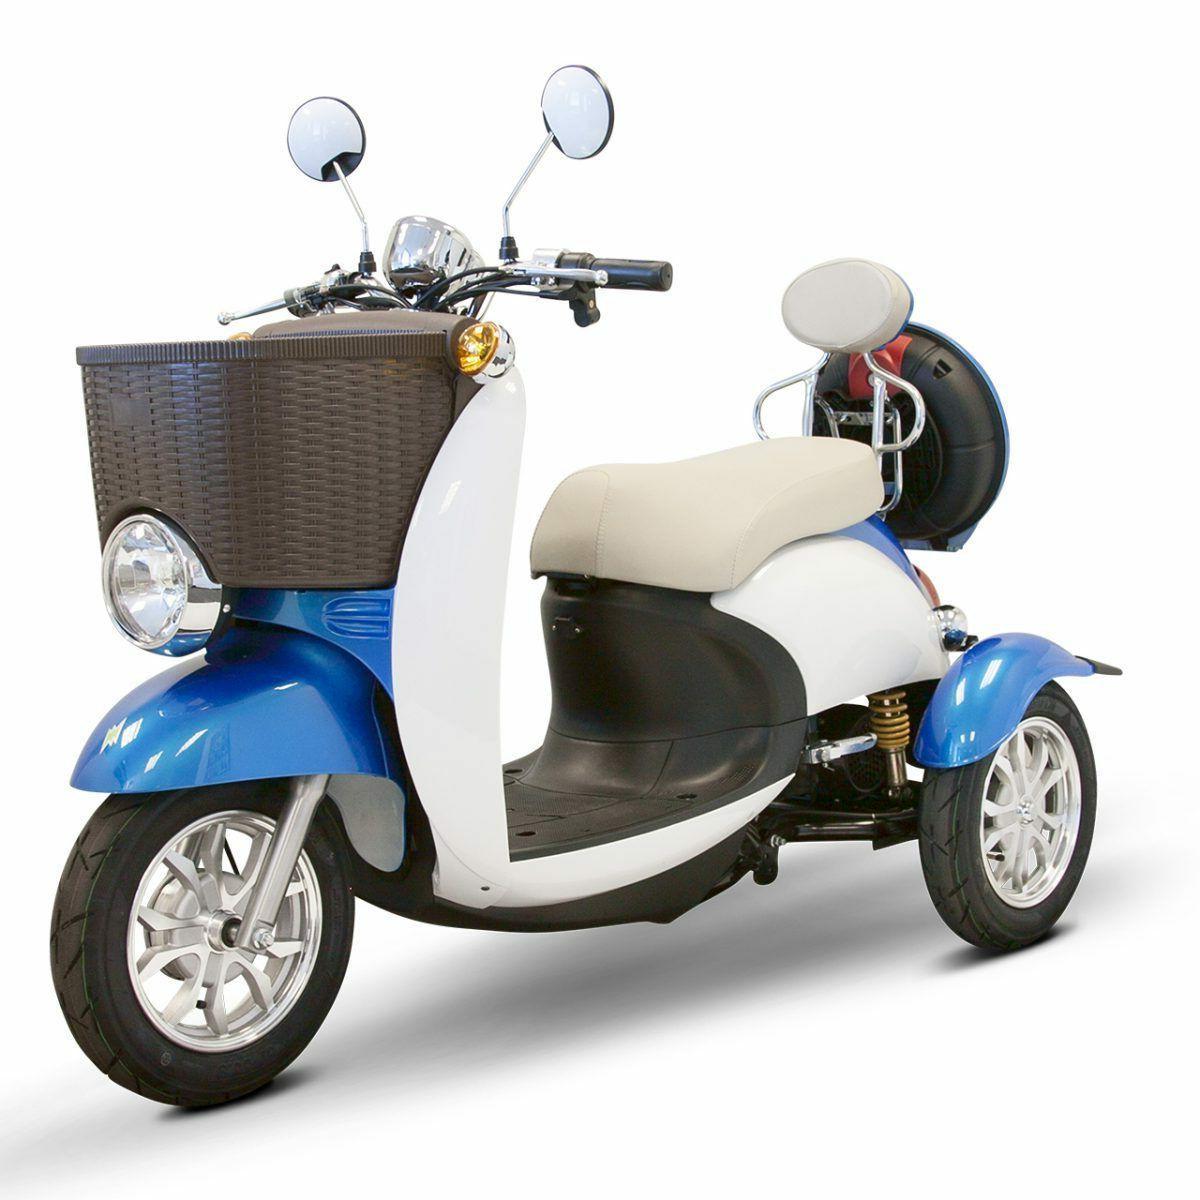 ew 11 euro scooter